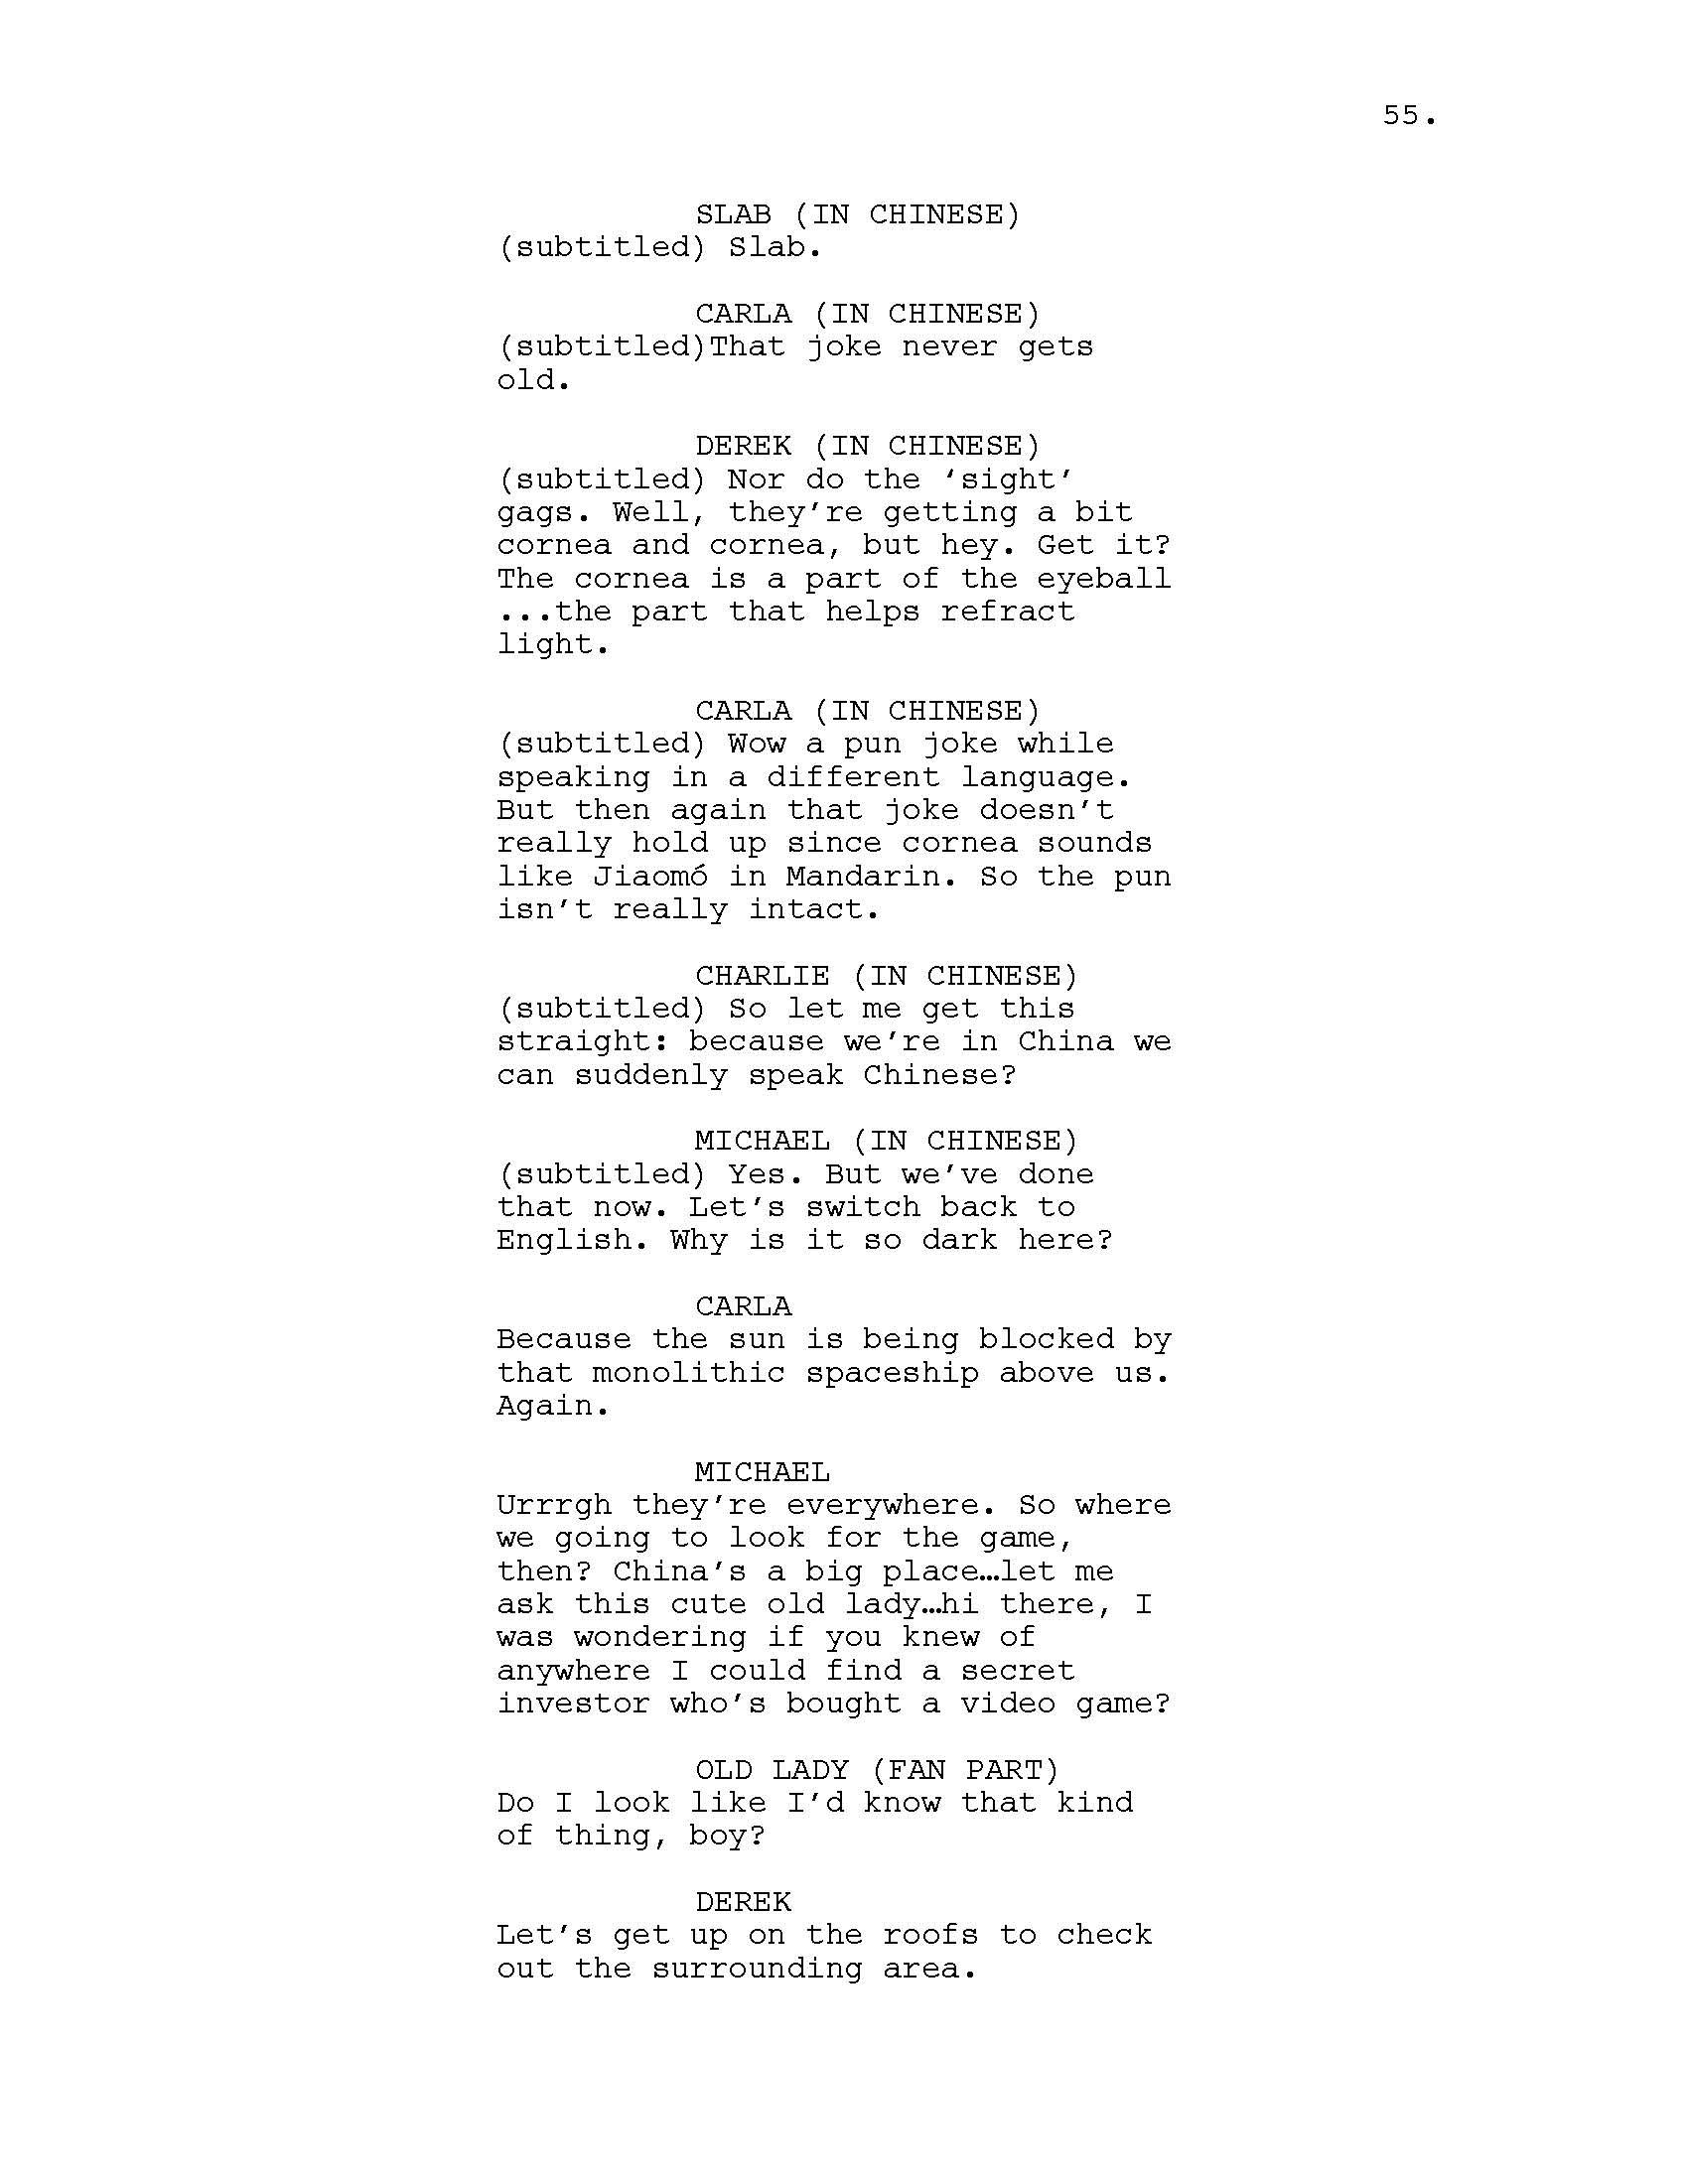 INVISIBLE WORLD SCRIPT_Page_056.jpg